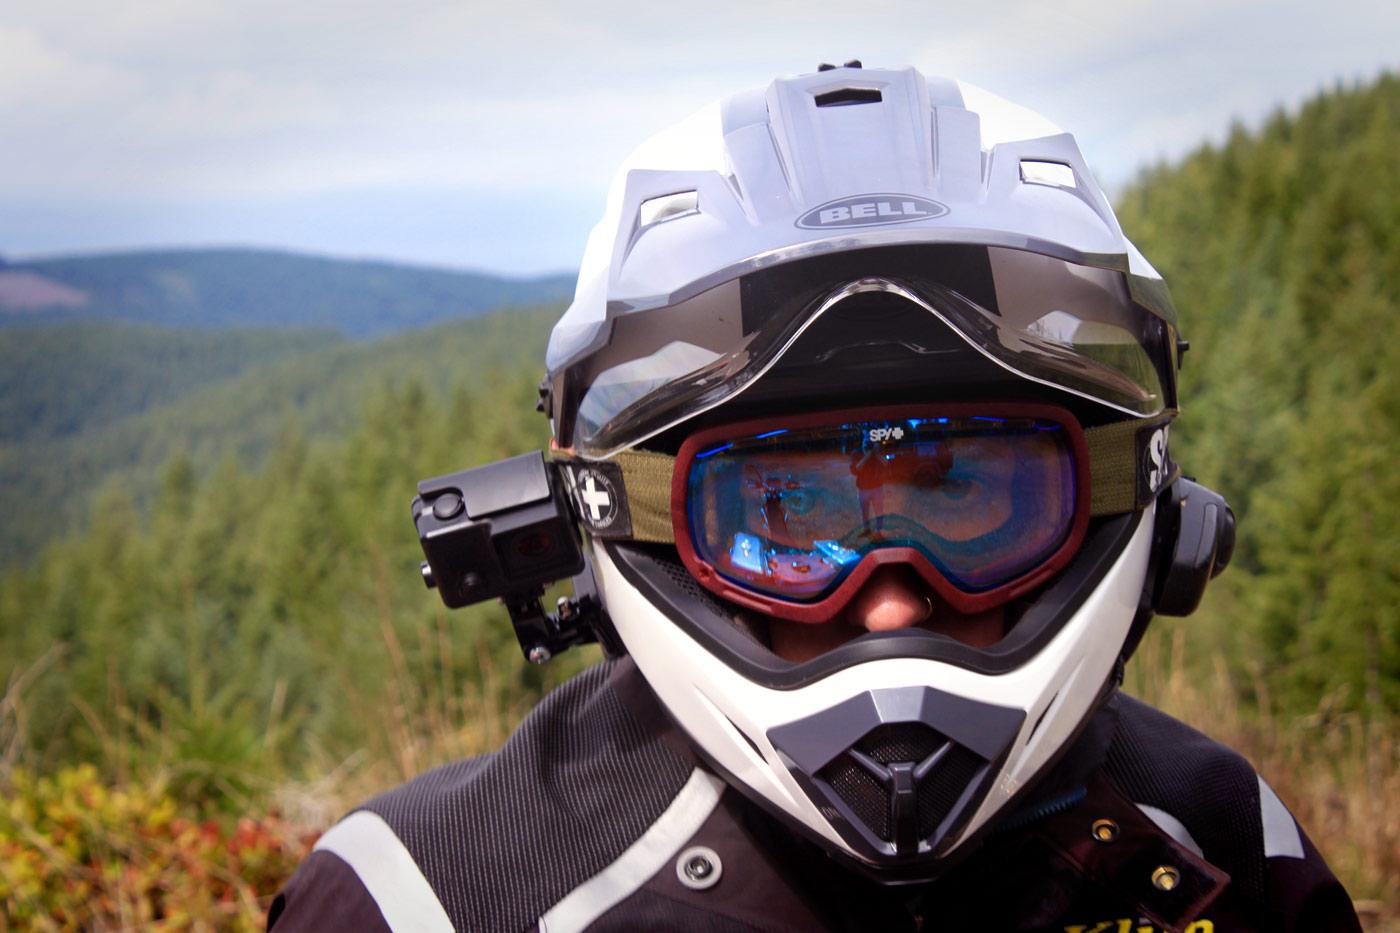 Bell Mx 9 Adventure Dual Sport Helmet Review Adv Pulse